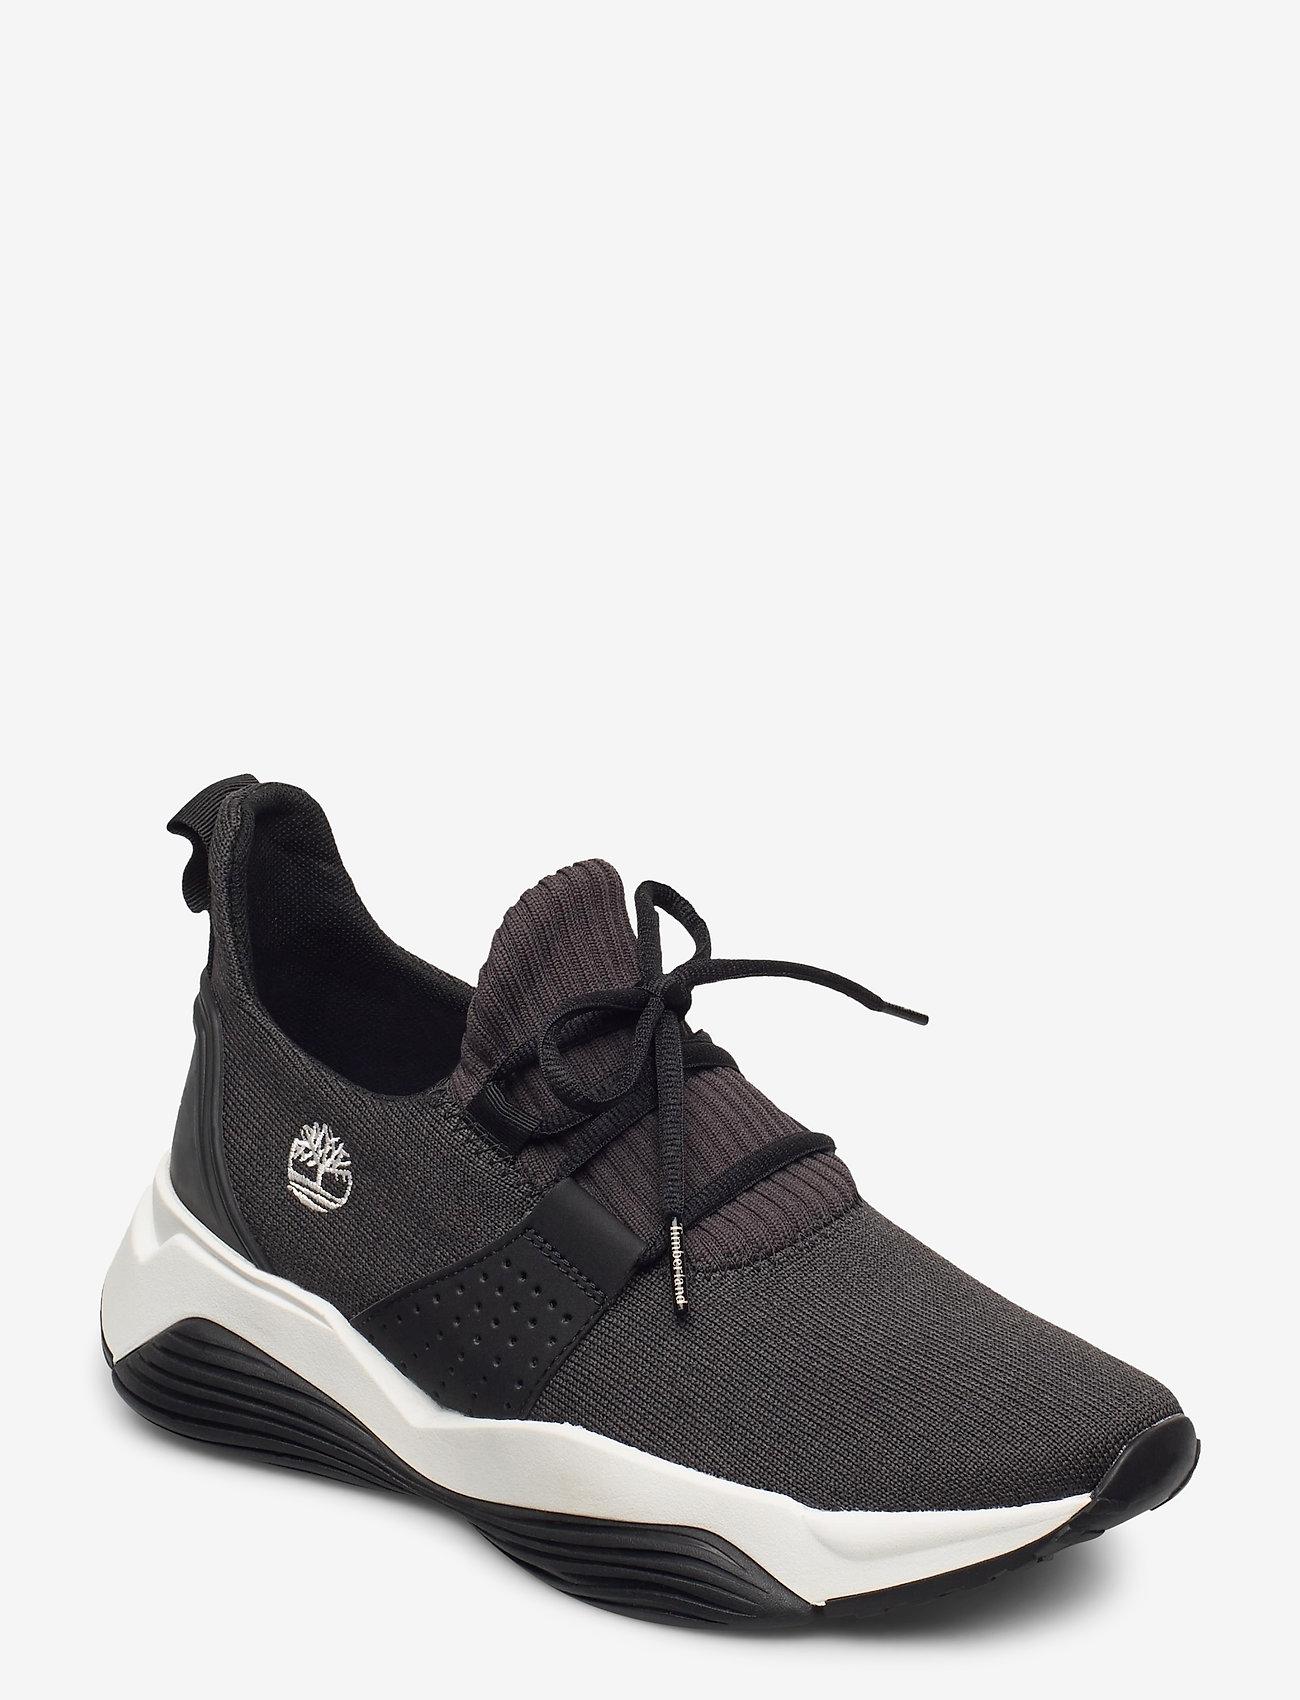 Timberland - EMRLD BAY KNIT BLK - lage sneakers - black - 0